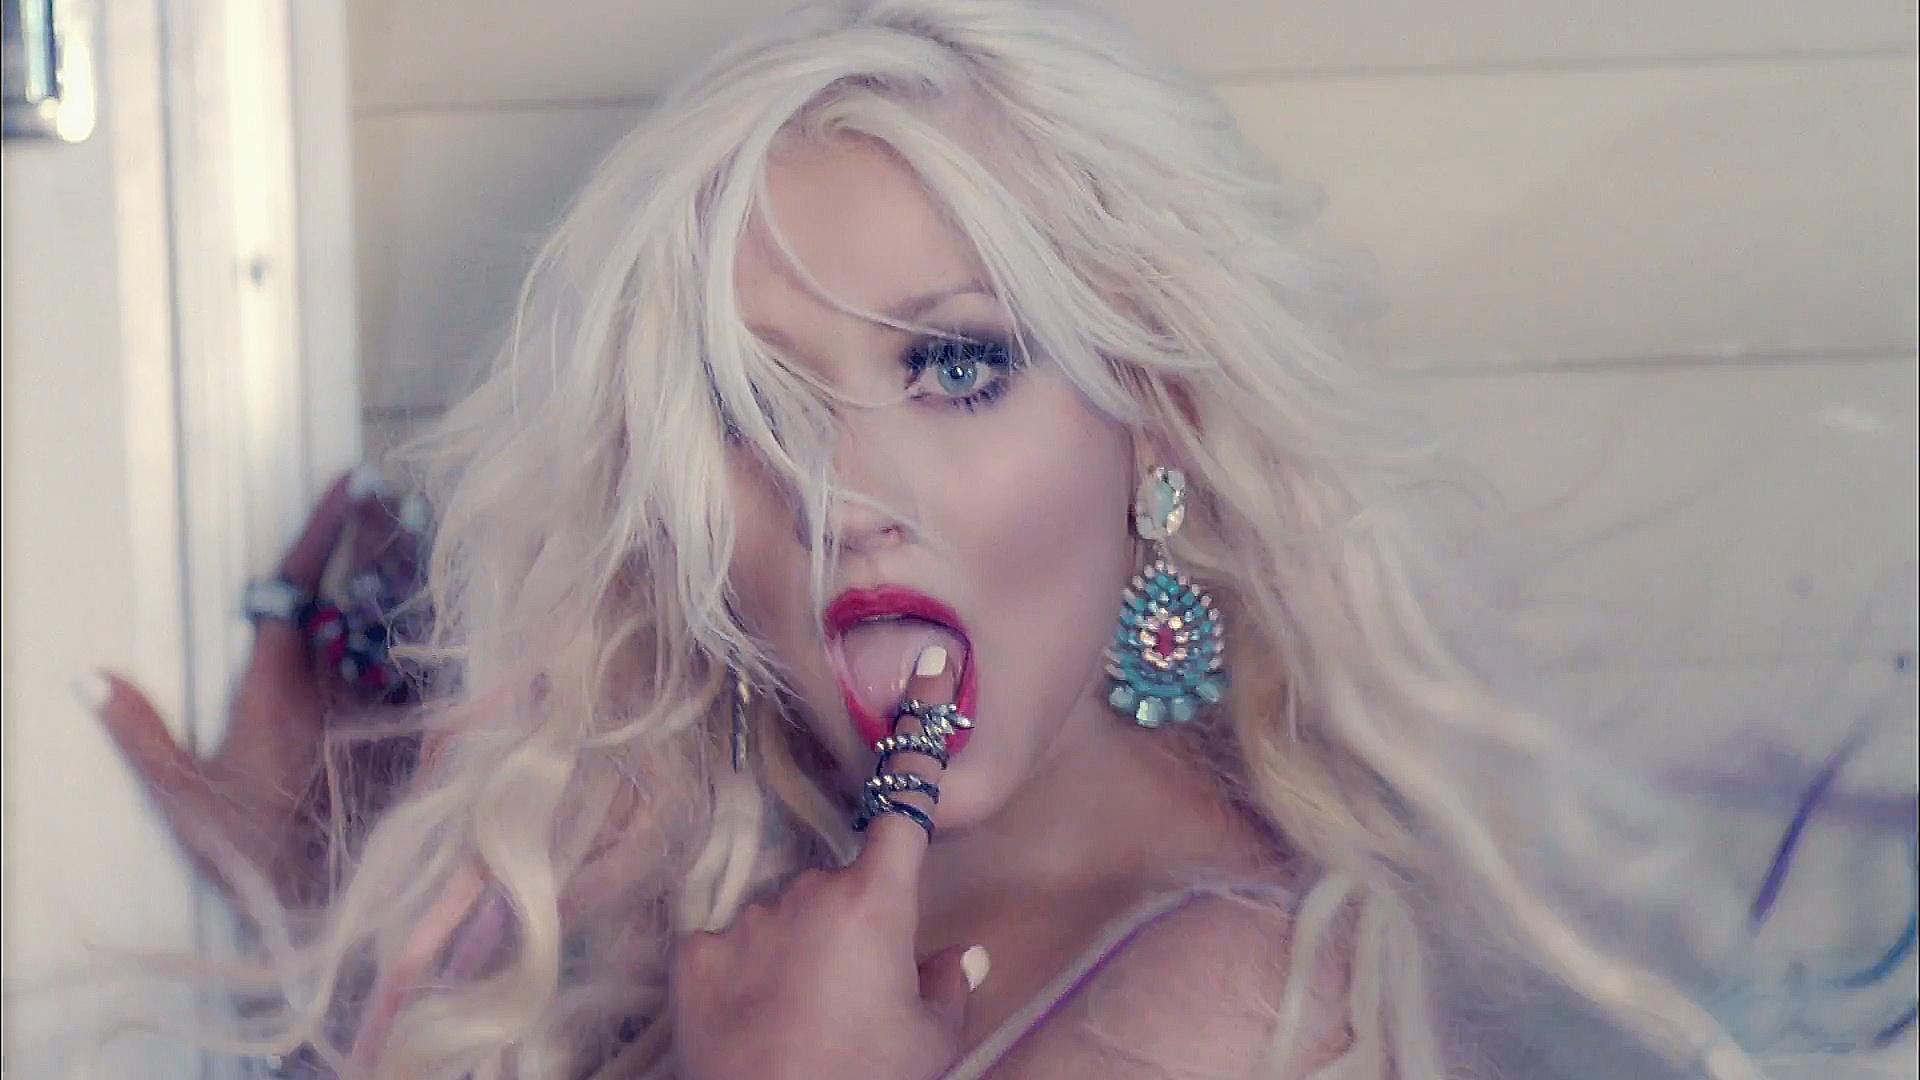 Your Body (Christina Aguilera song)